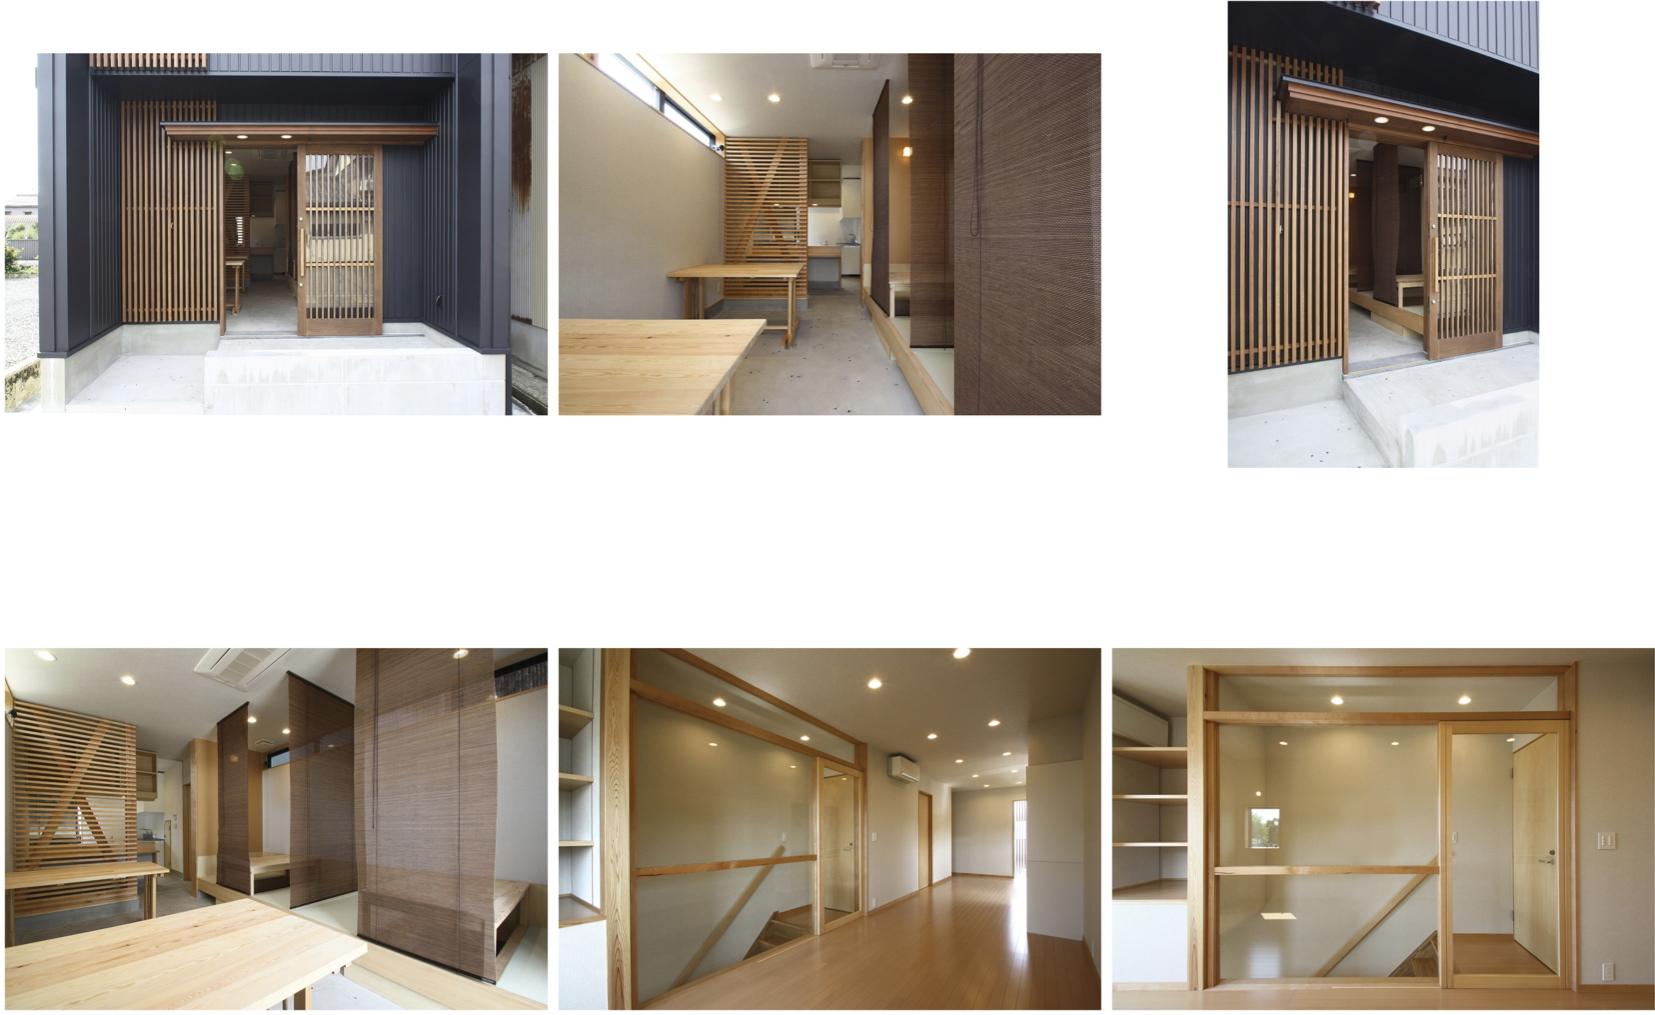 NM-House 改め 「もんや」!!_f0165030_15285568.jpg